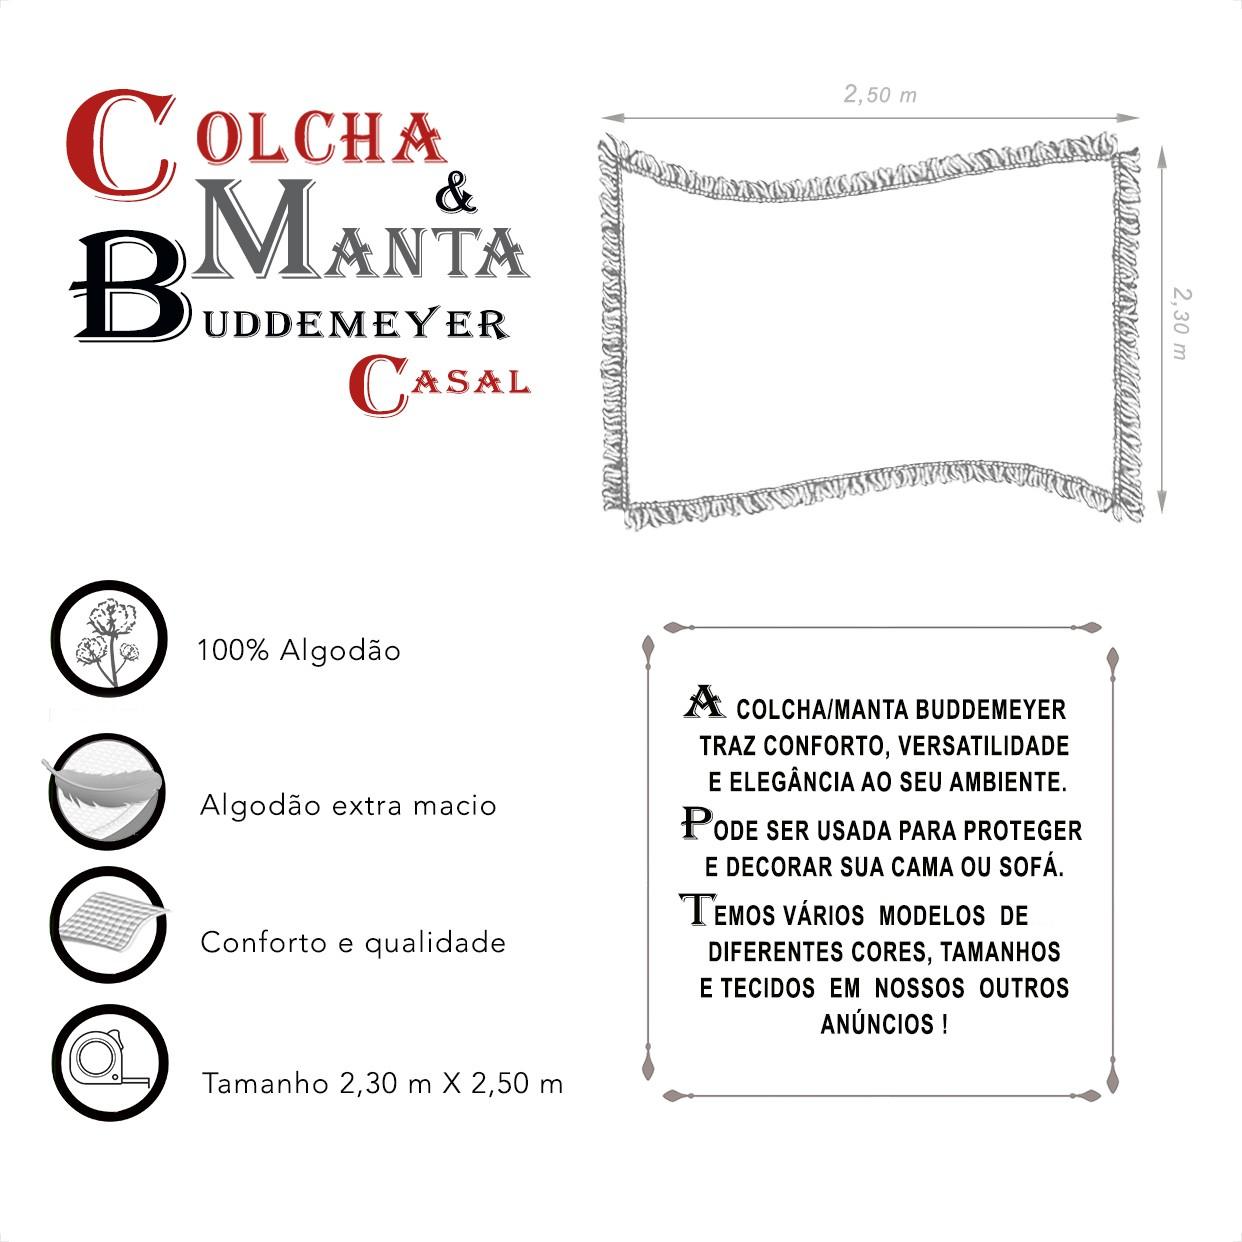 Manta e Colcha Buddemeyer Casal Cinza Claro 2,30m x 2,50m